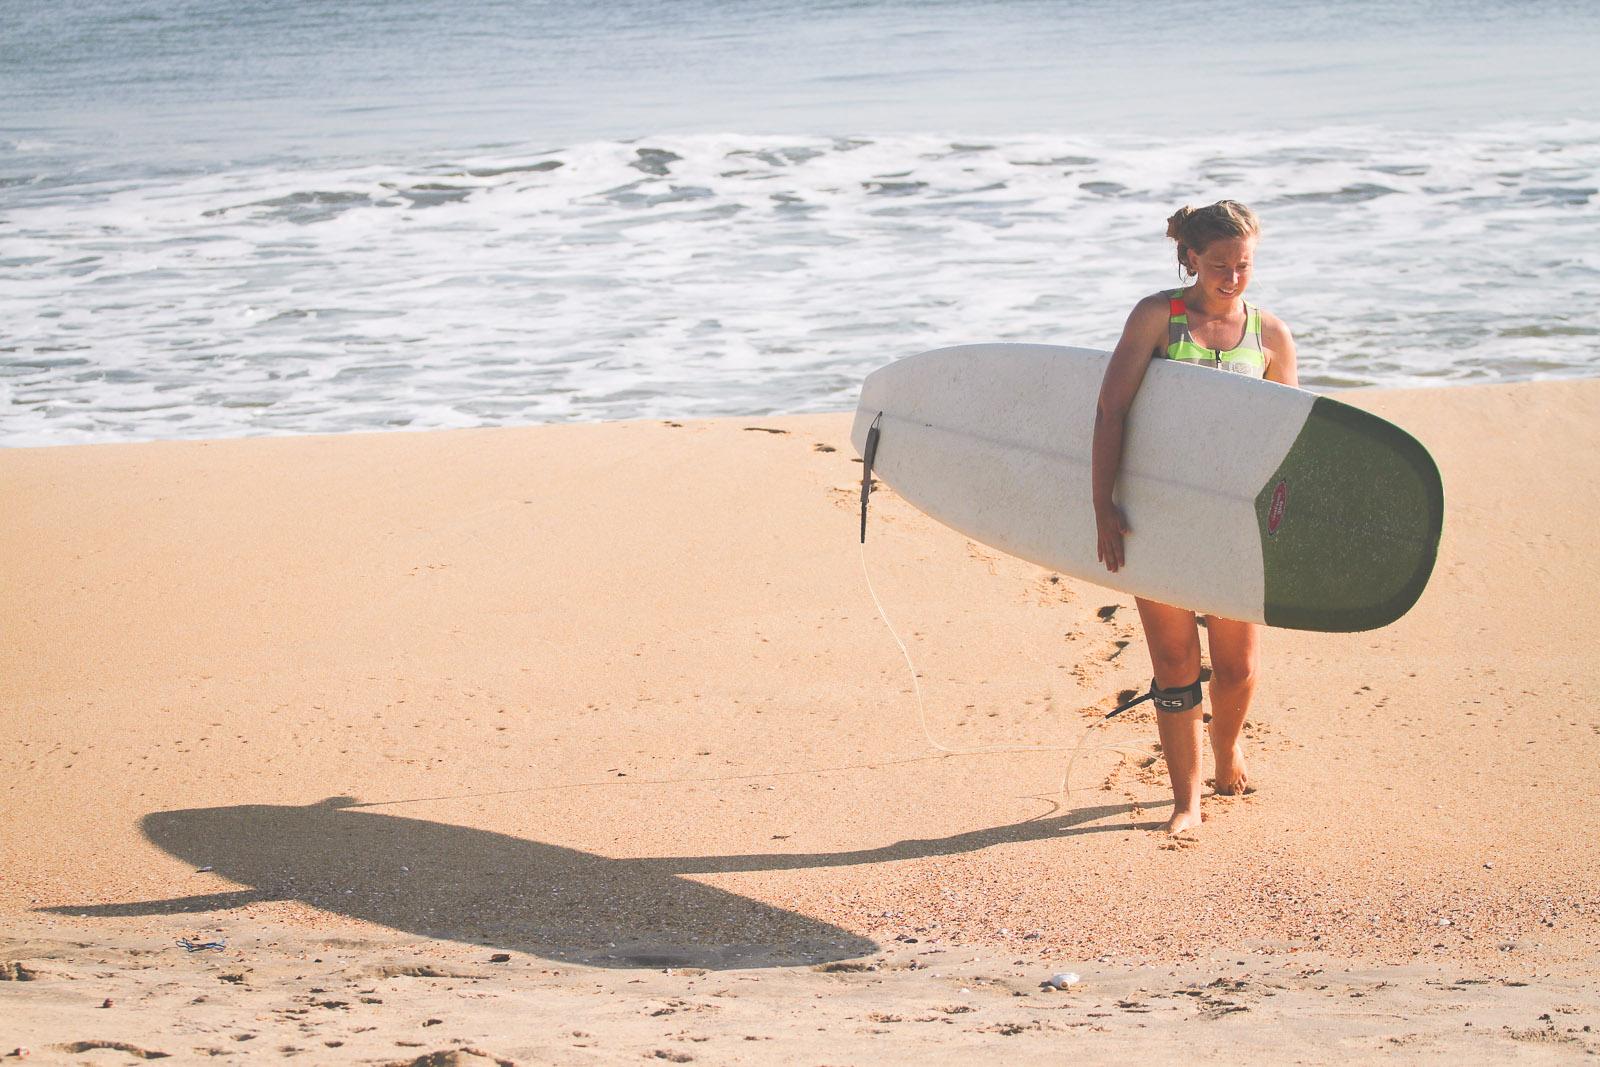 Sunshinestories-surf-travel-blog-IMG_9207